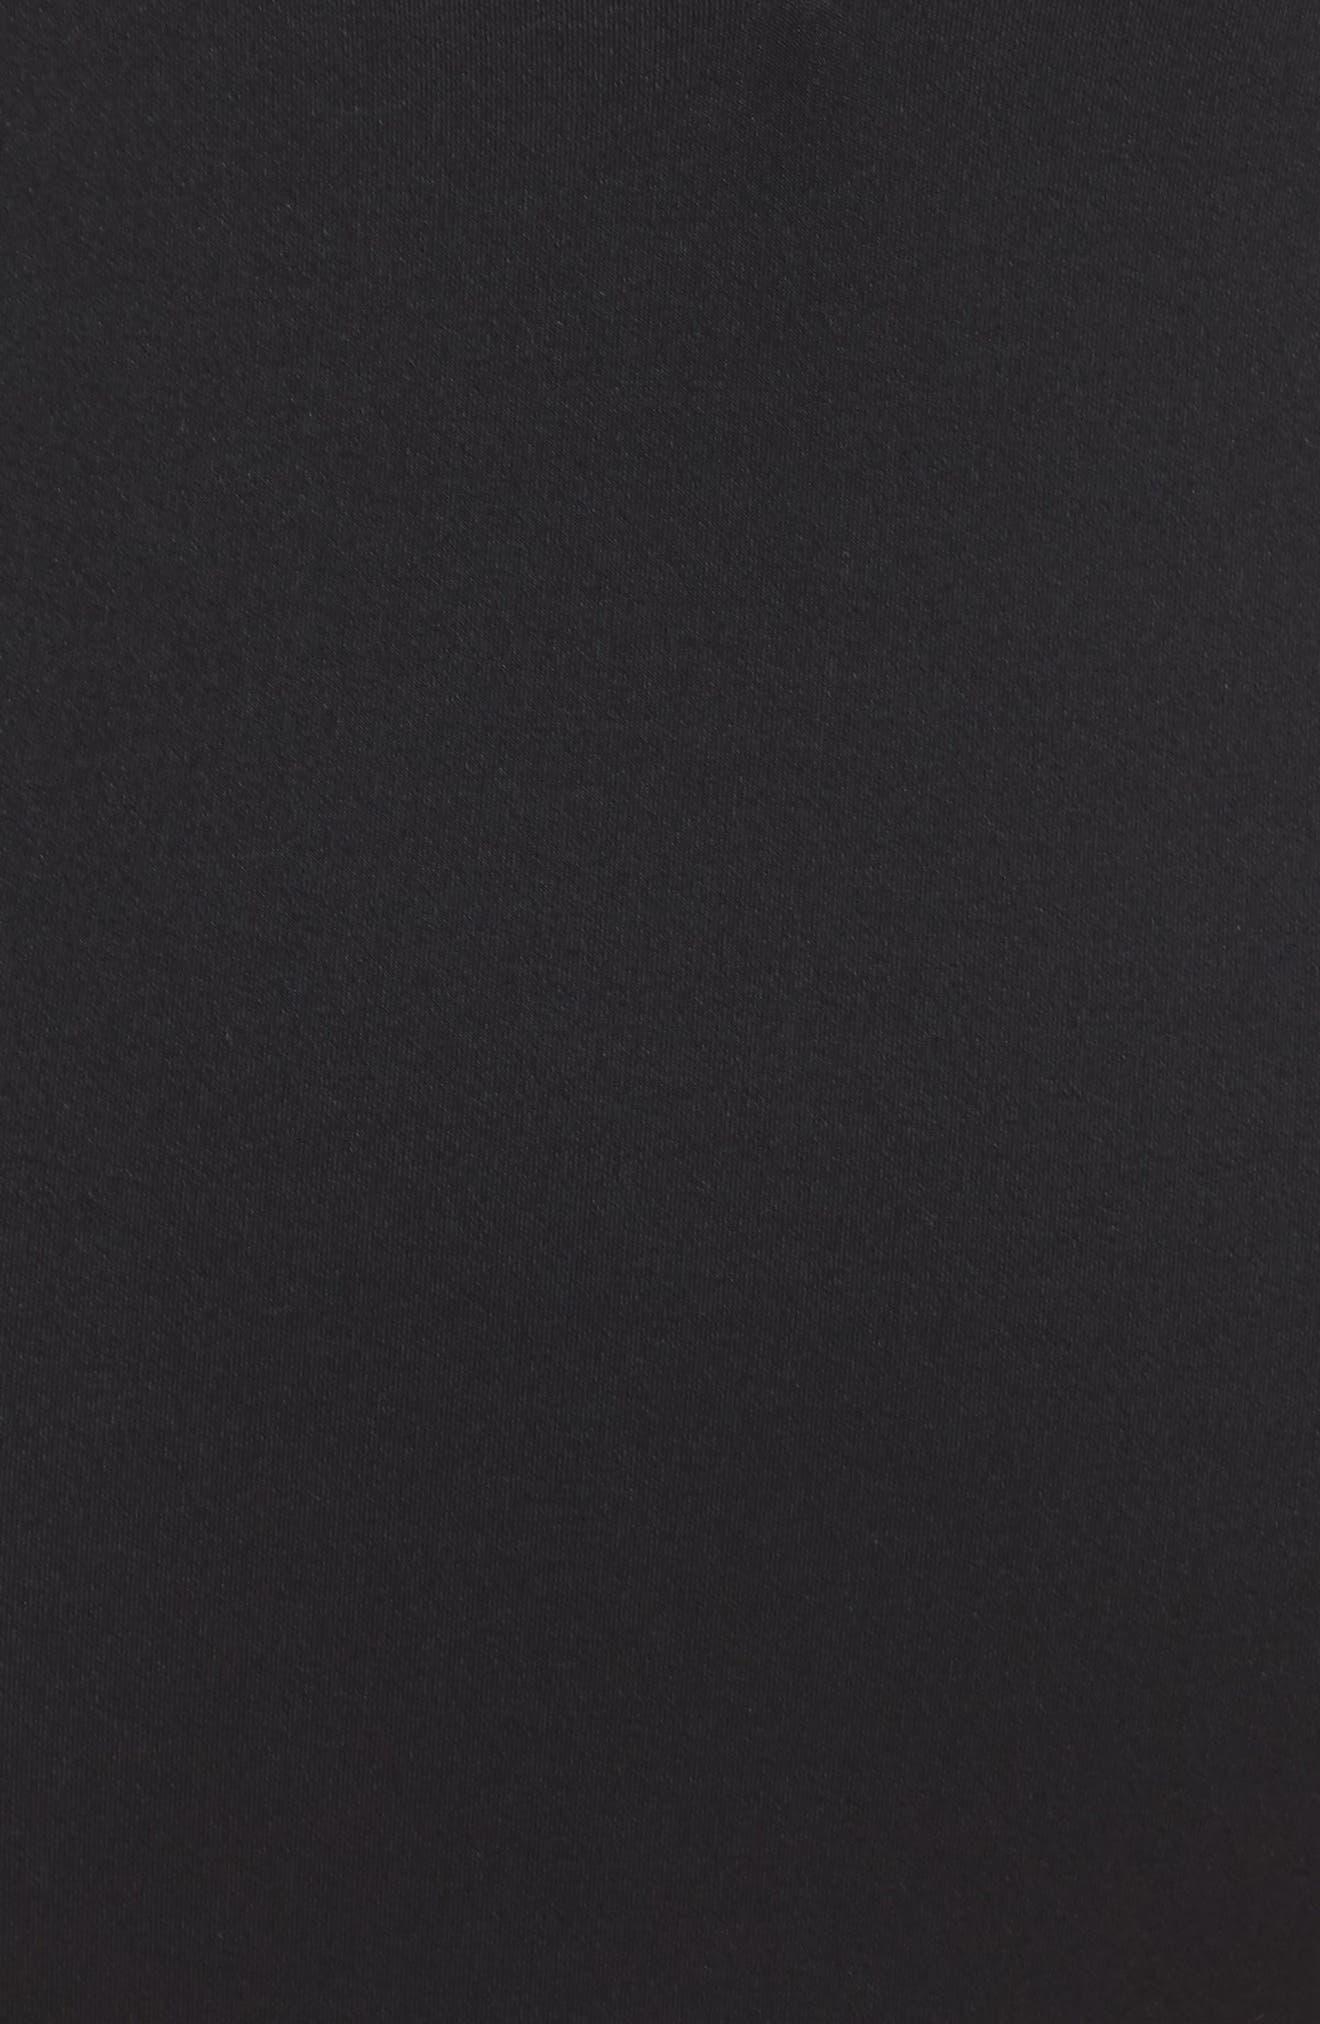 BECCA, Color Code Plunge One-Piece Swimsuit, Alternate thumbnail 5, color, BLACK